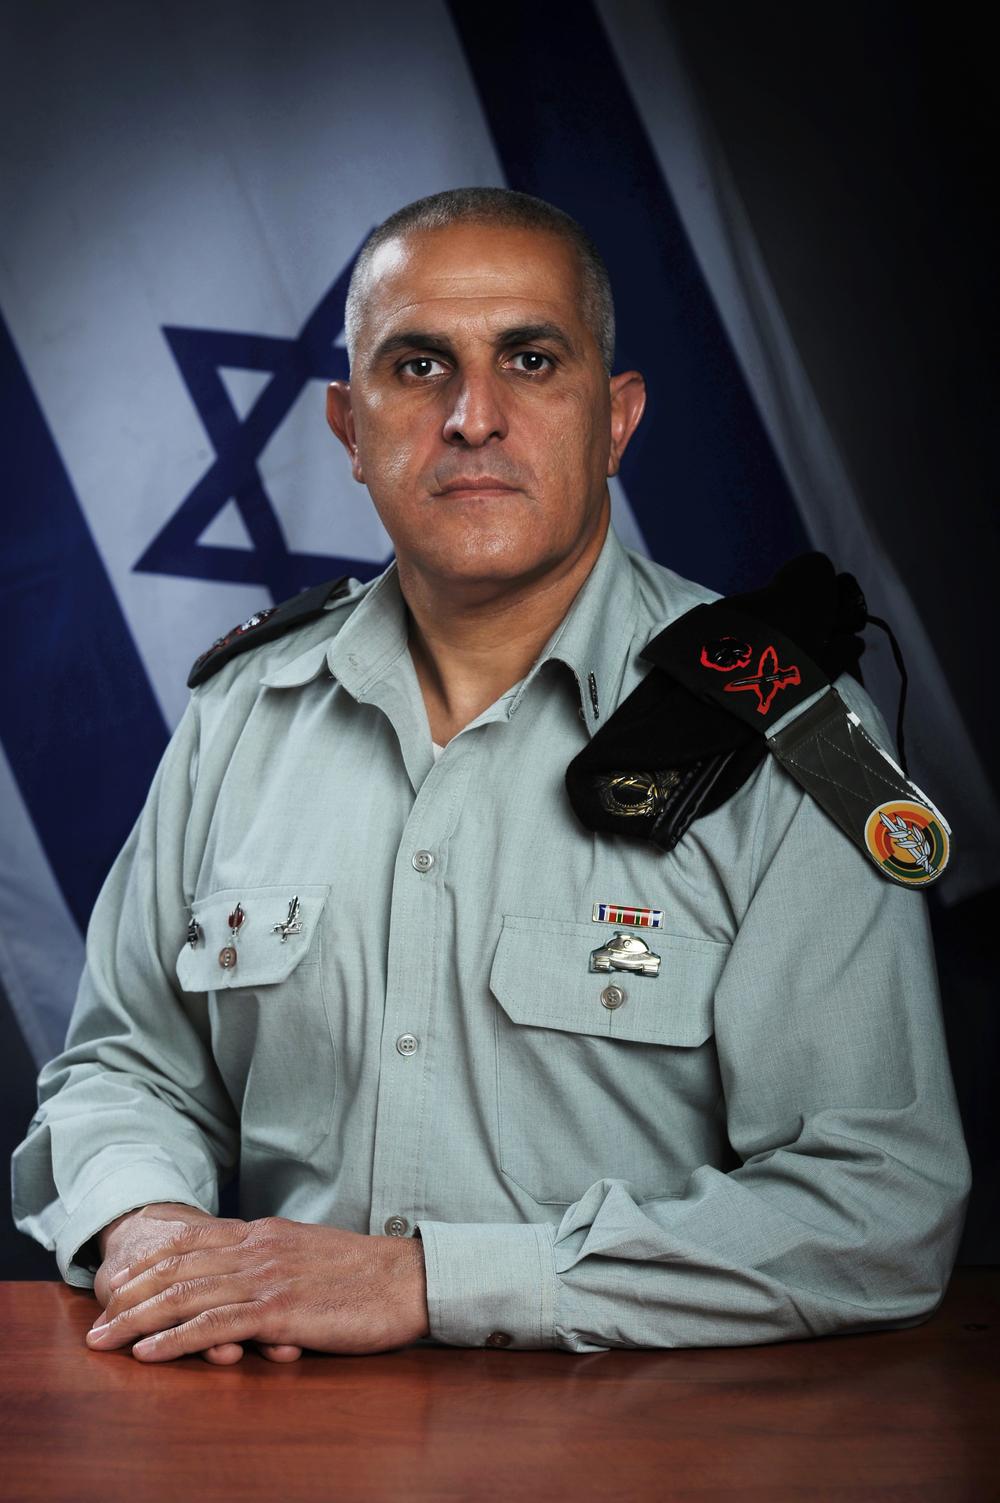 IDF southern commander Major General Sami Turgeman. Credit: IDF Spokesperson.